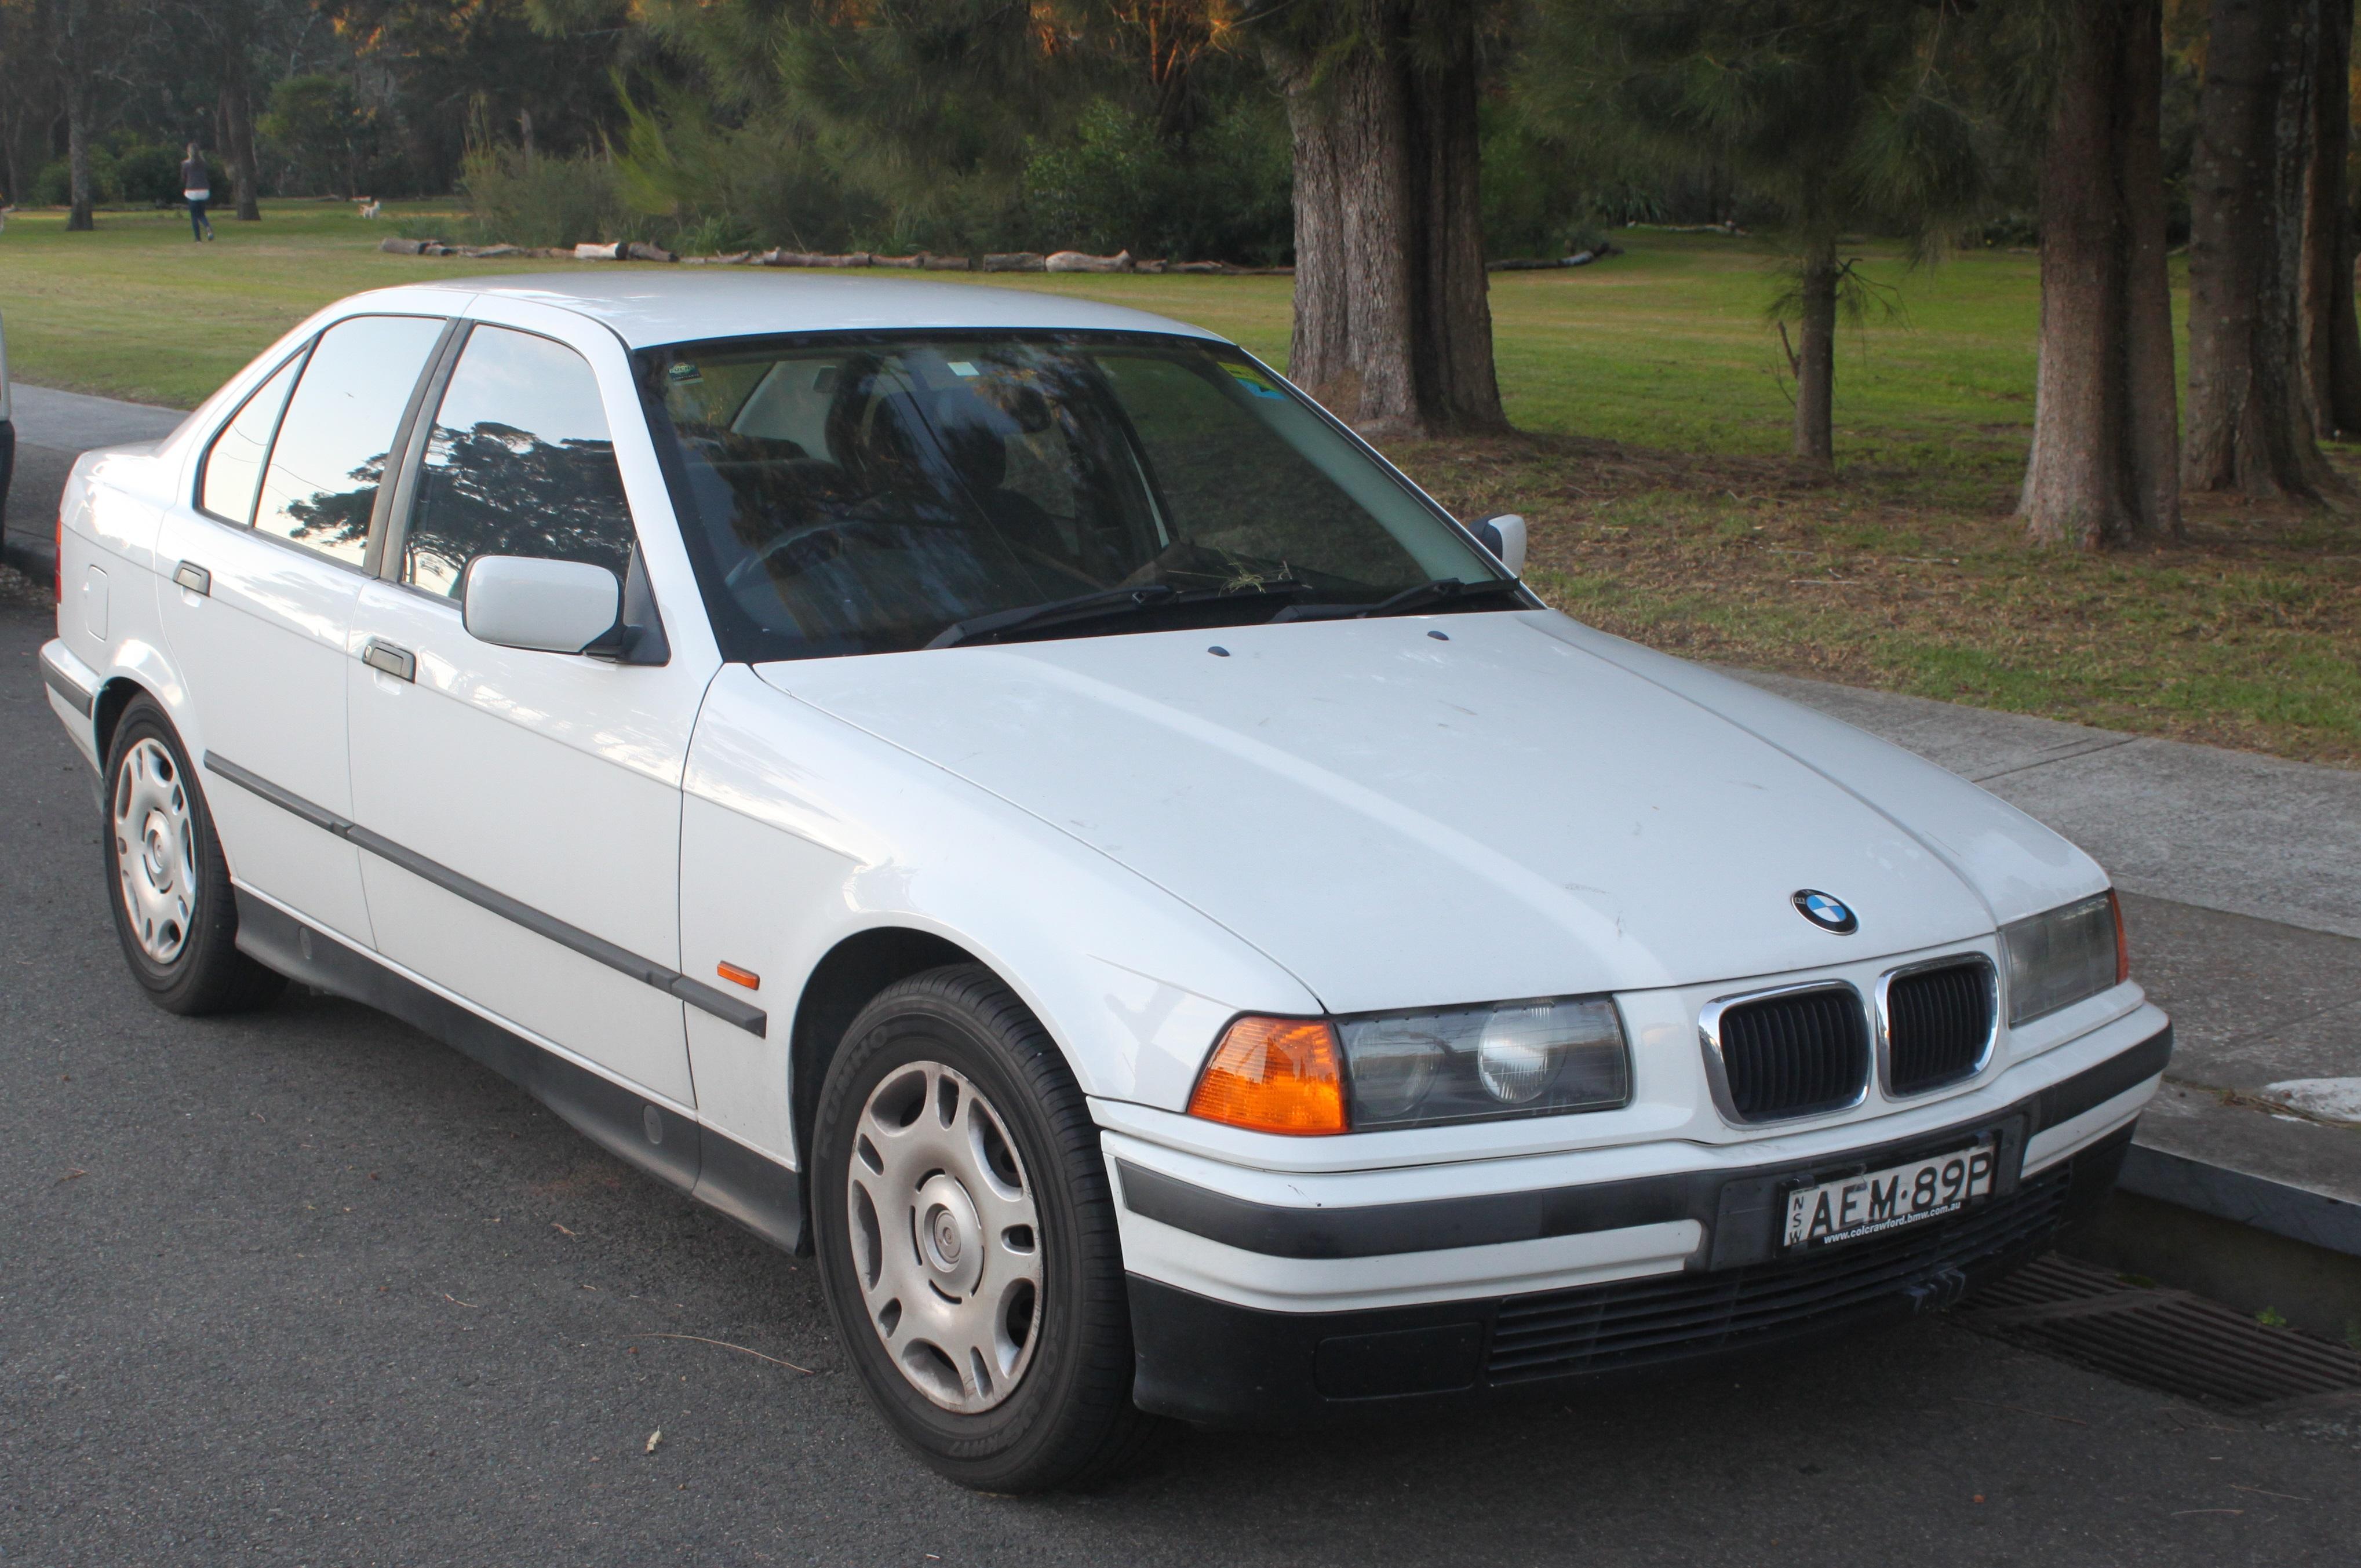 File 1997 Bmw 318i E36 Sedan 18555132392 Cropped Jpg Wikimedia Commons